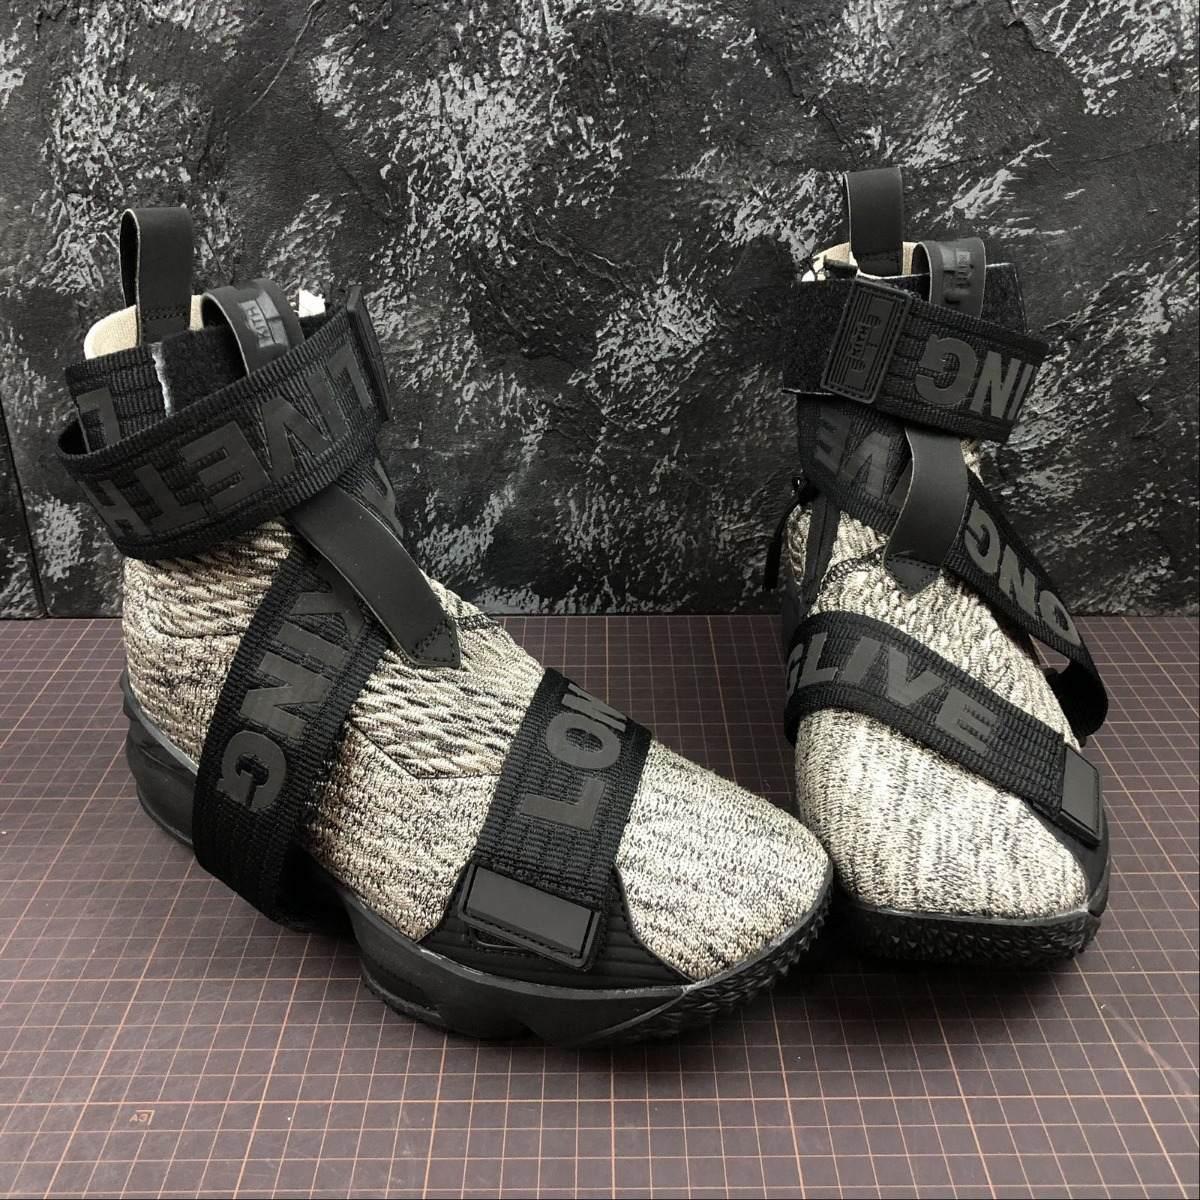 new arrival cb137 6033e Nike Lebron 15 Xv Kith Concrete Original